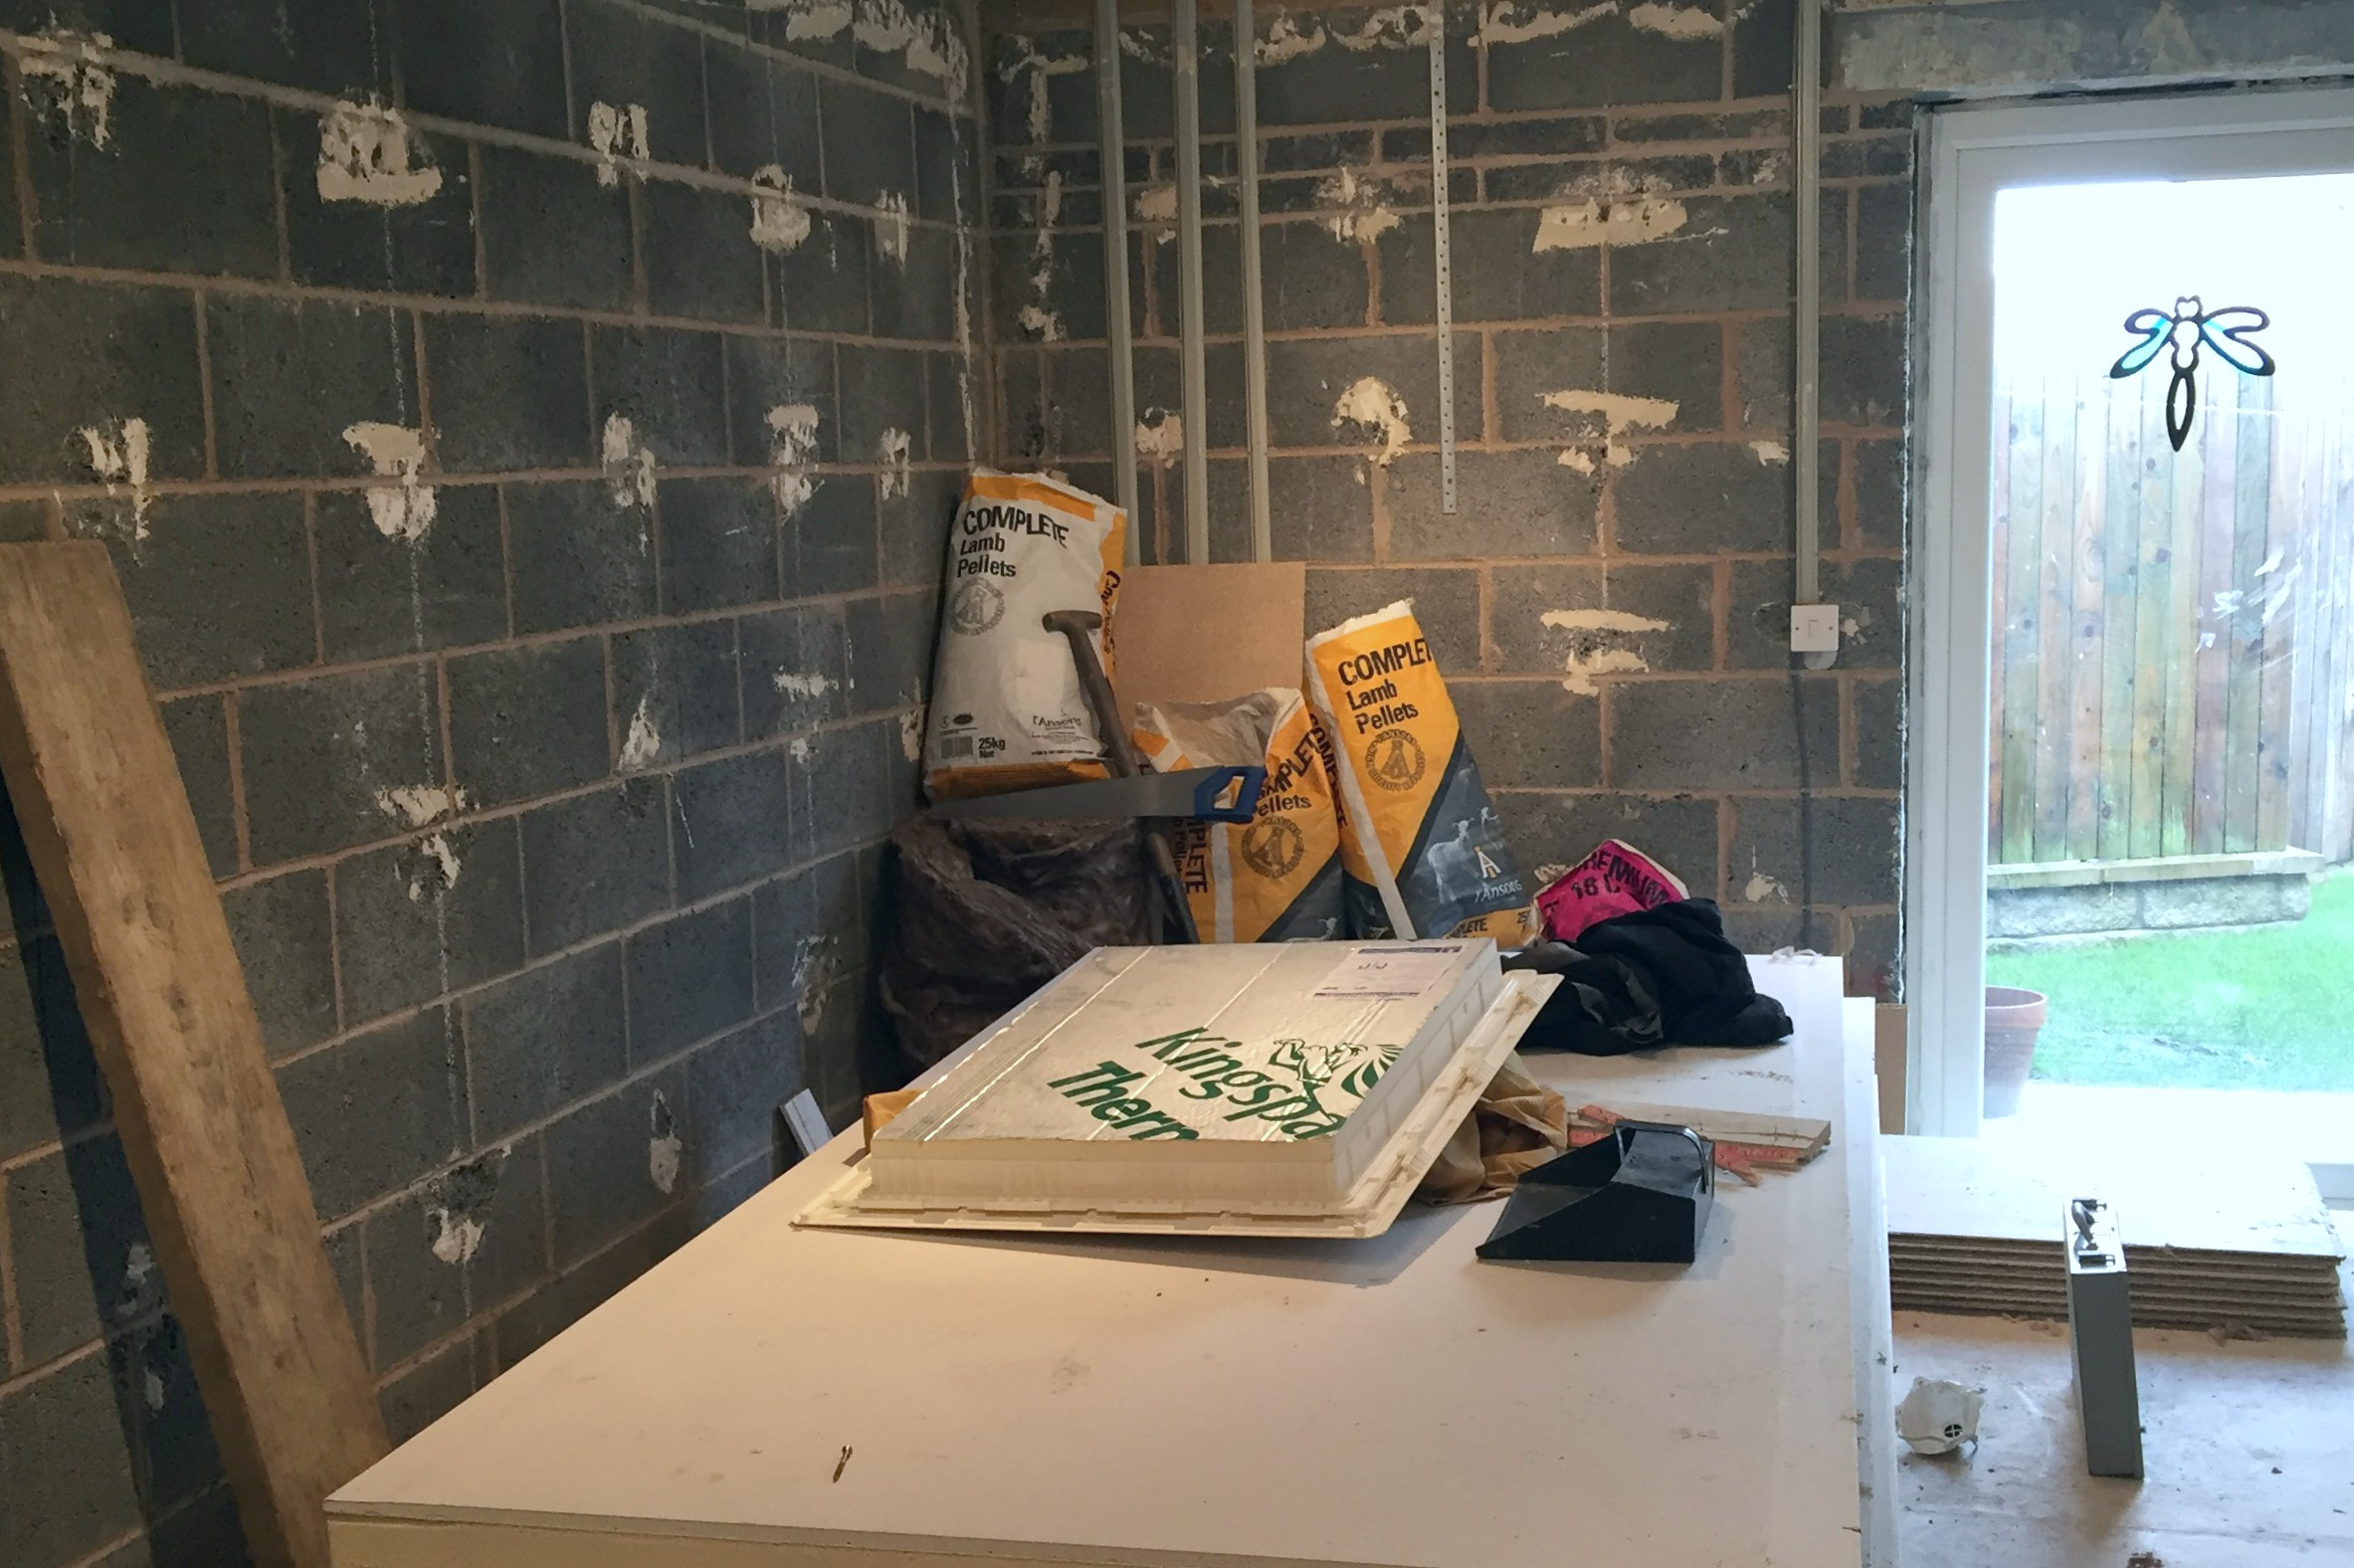 Playroom stripped back